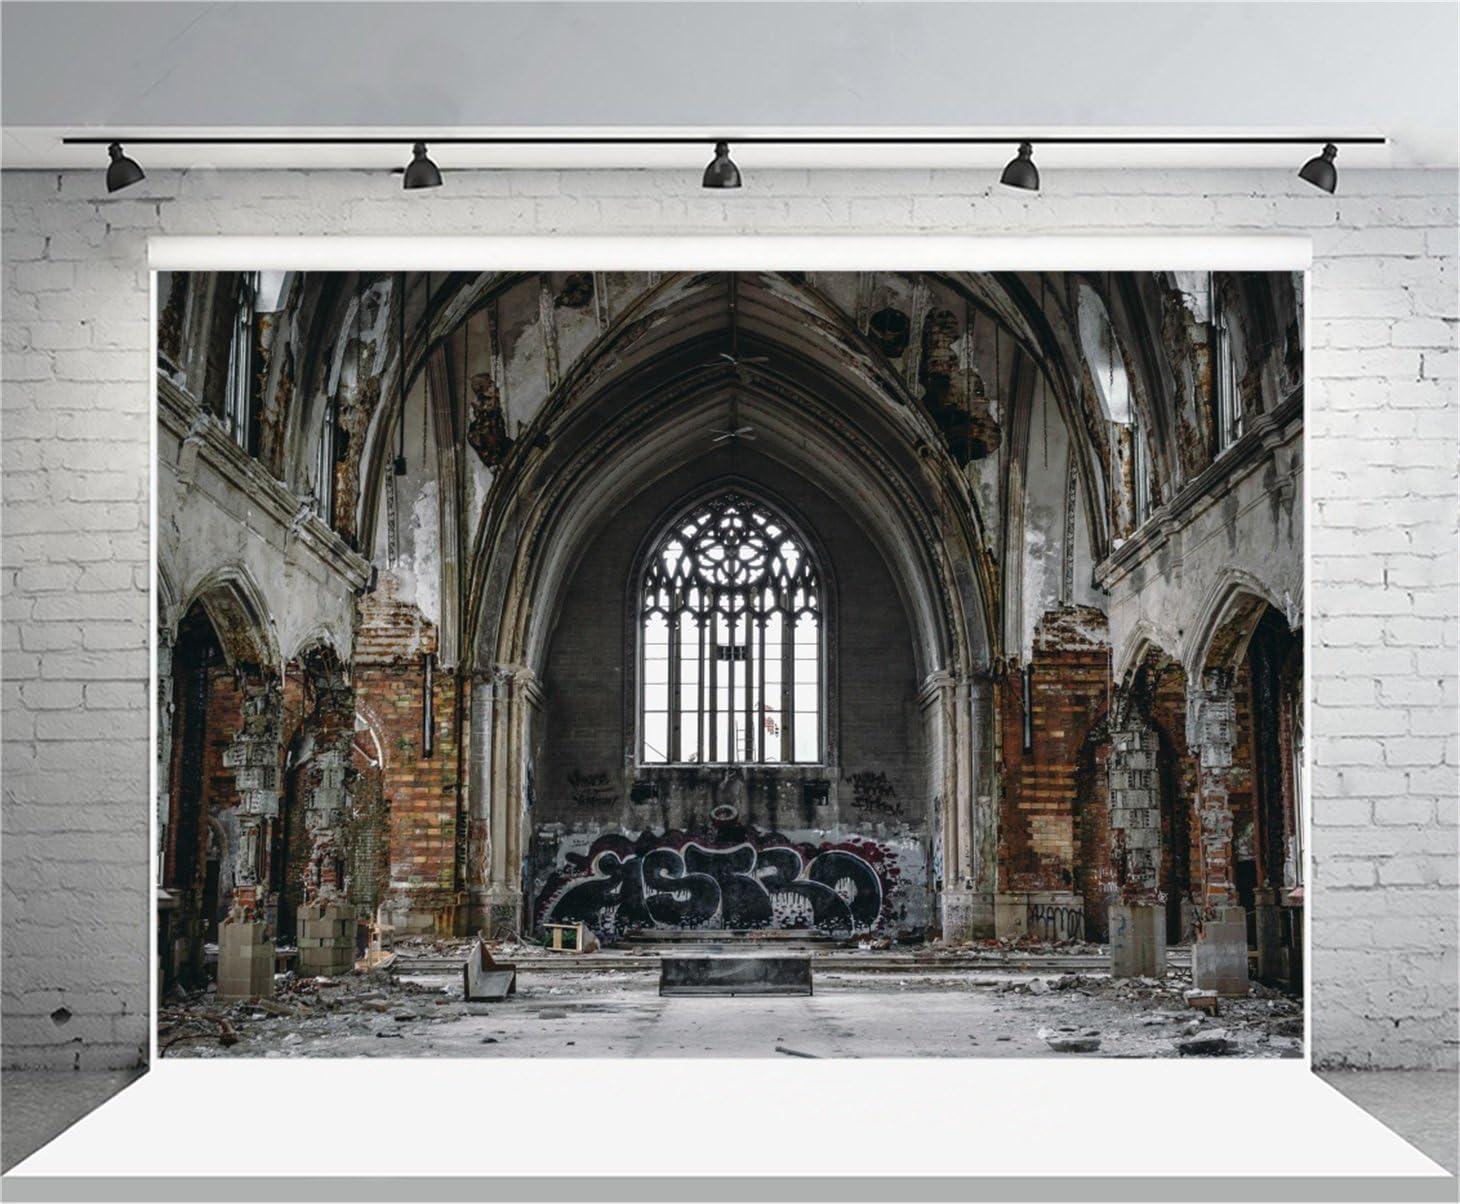 GoEoo 7x5ft Collegiate Church Backdrop European Historic Building Photography Background Ruins Grunge Door Wedding Shooting Backdrop Children Adults Portraits Photo Studio